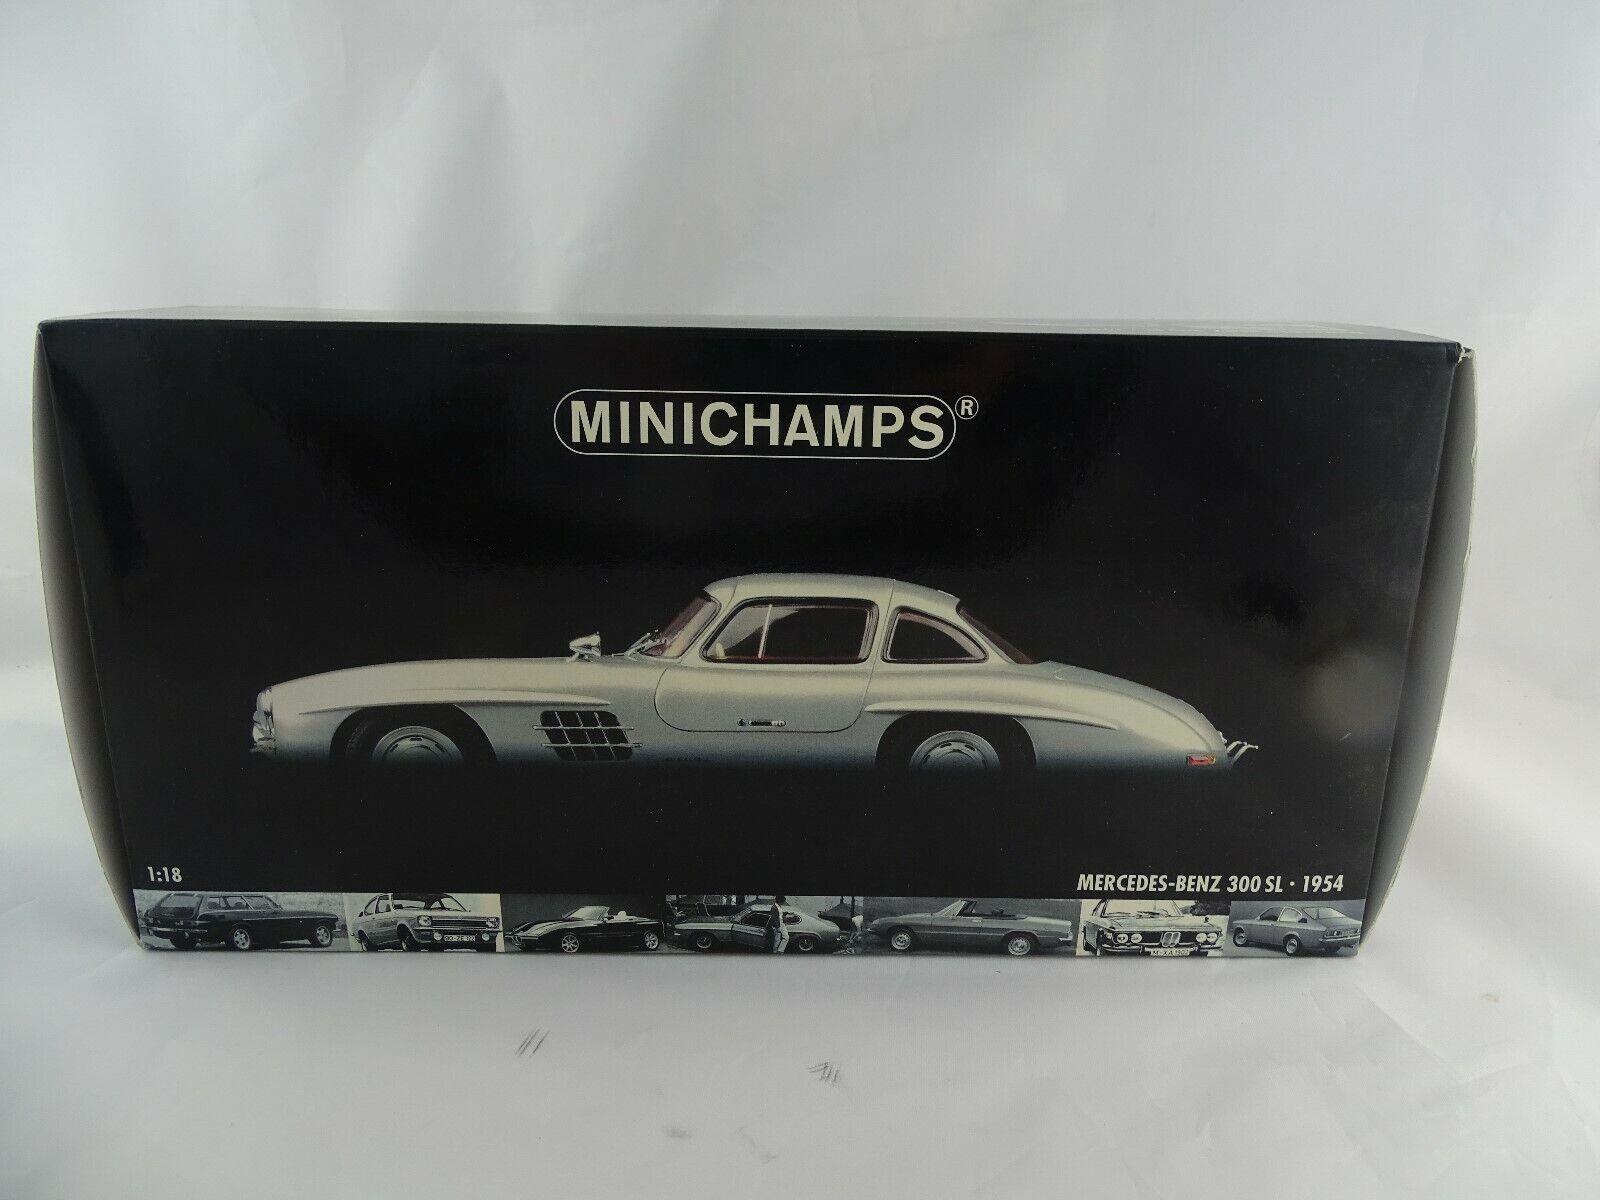 1 18 Minichamps  180039000 Mercedes Benz 300 Sl 1954 Gullwing in Conf. Orig. §